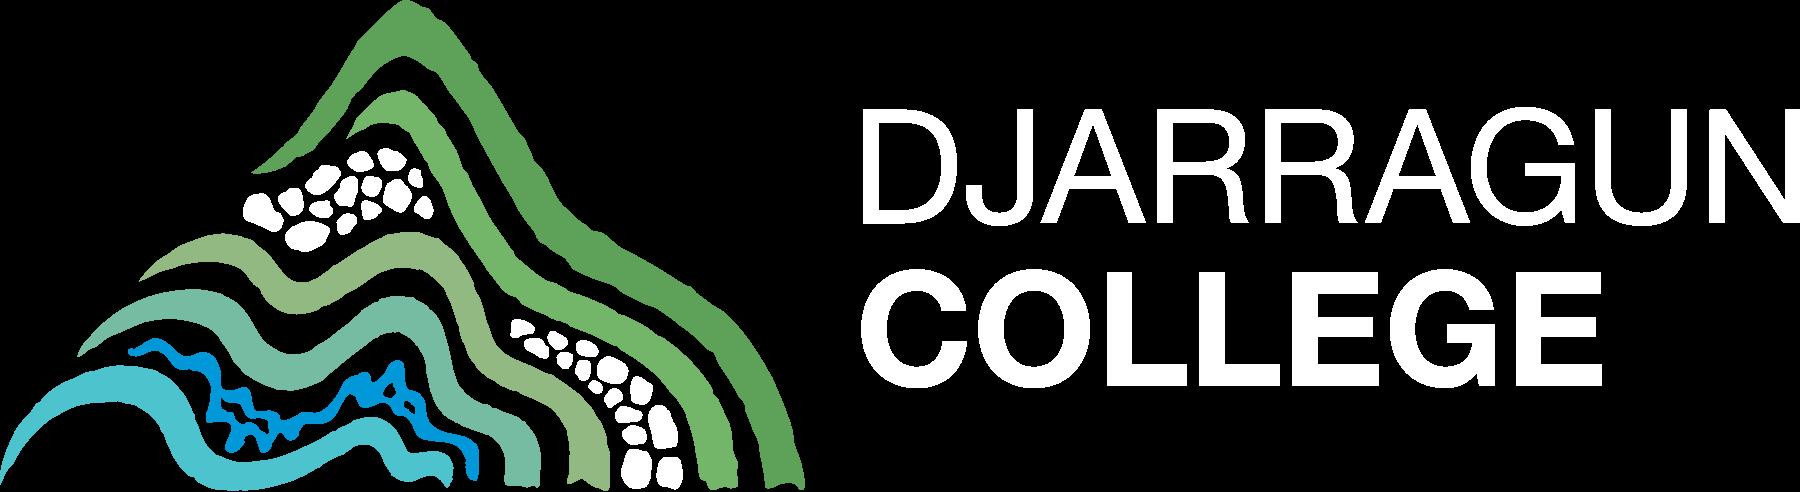 DJARRAGUN logo